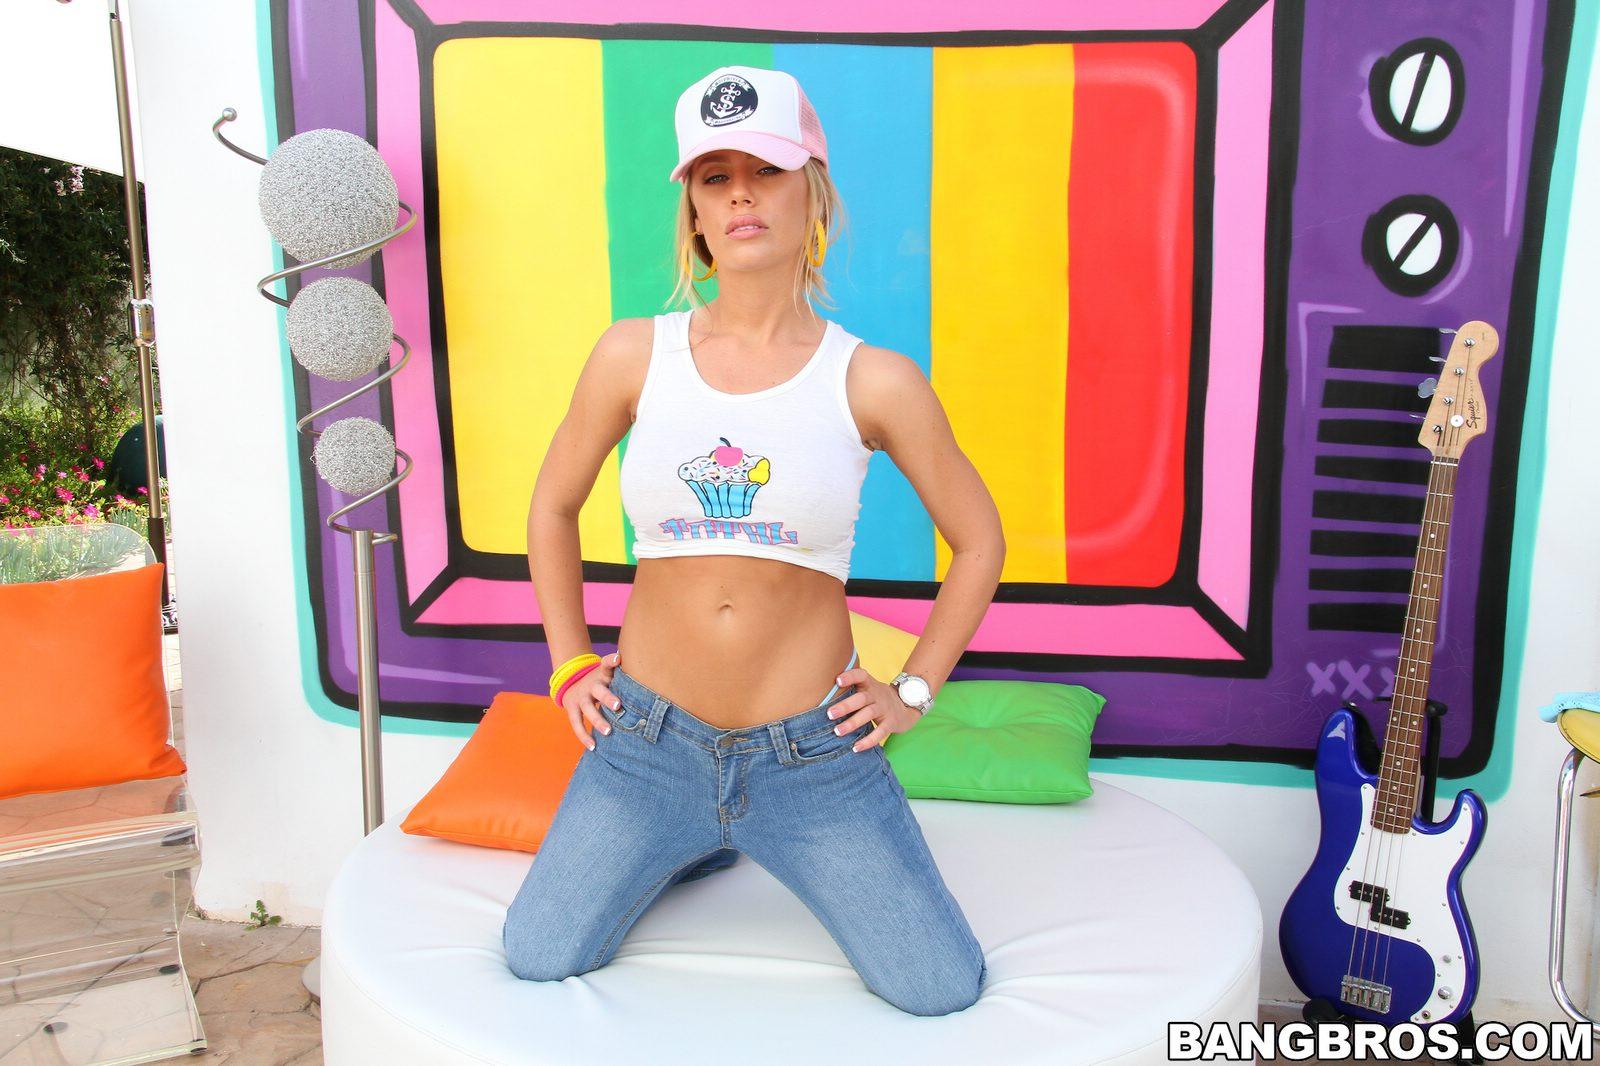 mypornstarbook net pornstars n nicole aniston gallery10 01